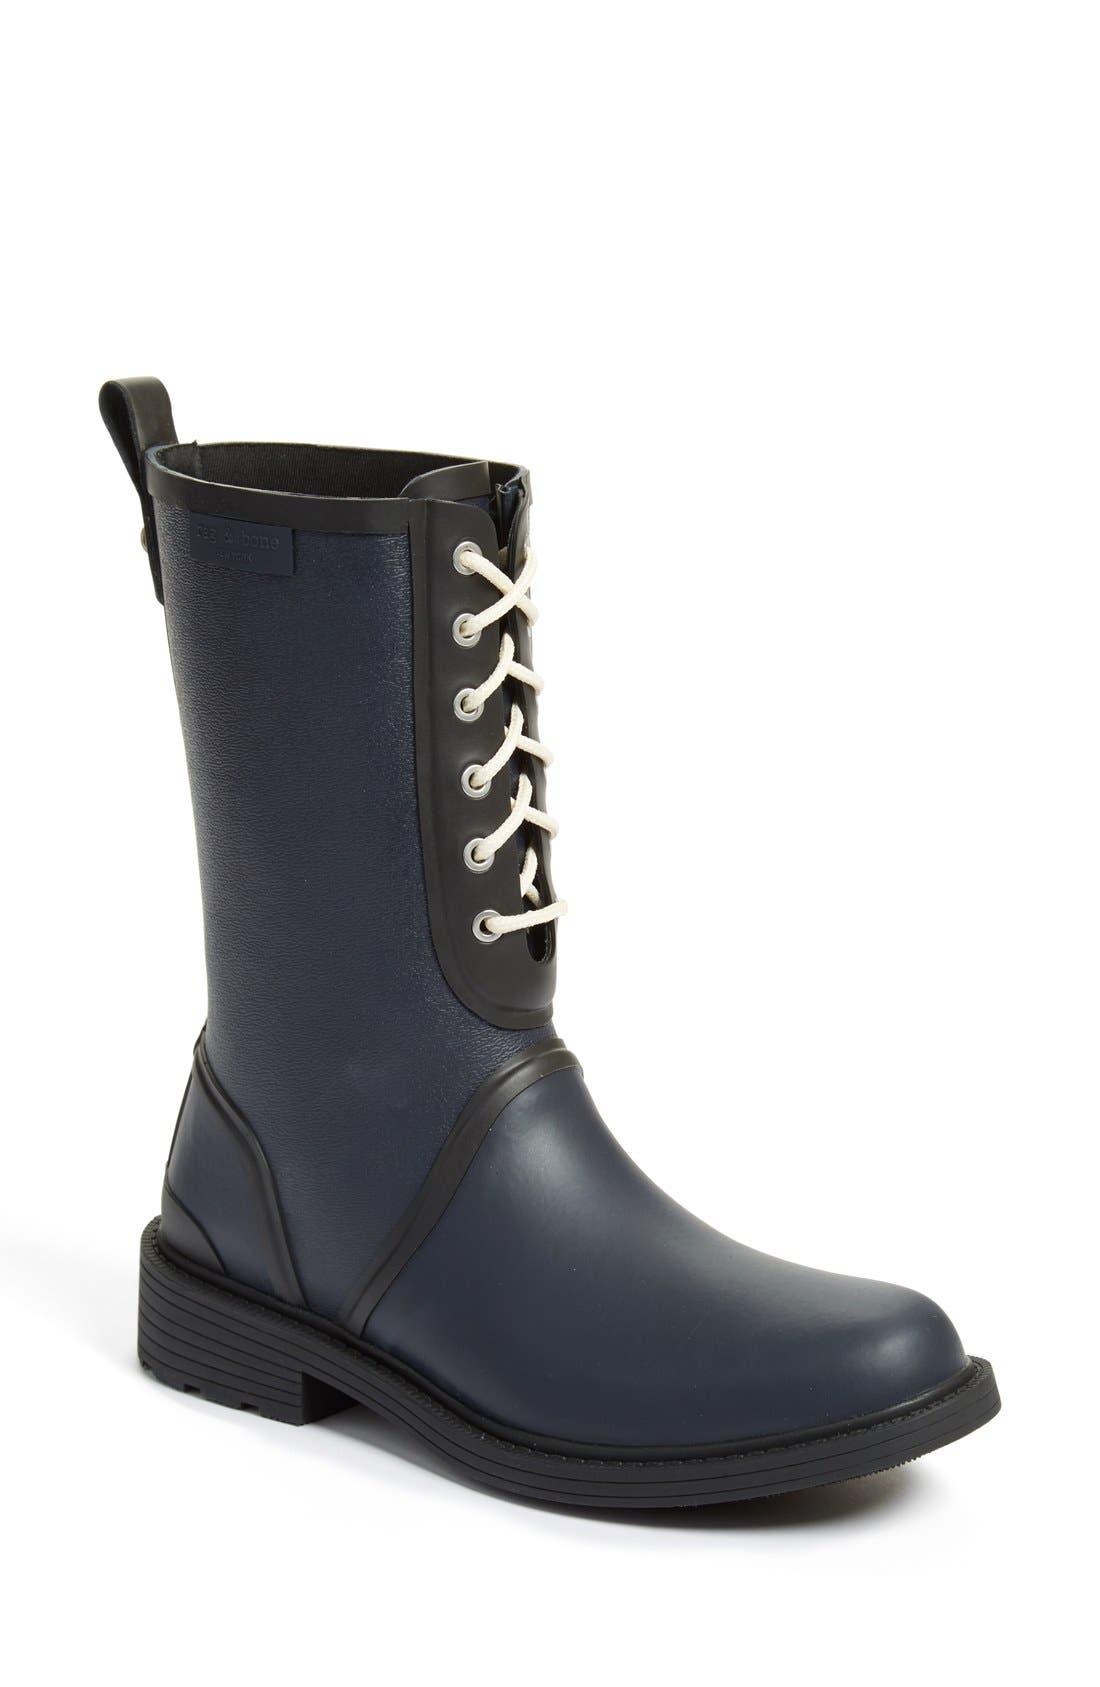 Alternate Image 1 Selected - rag & bone 'Ansel' Rain Boot (Women)